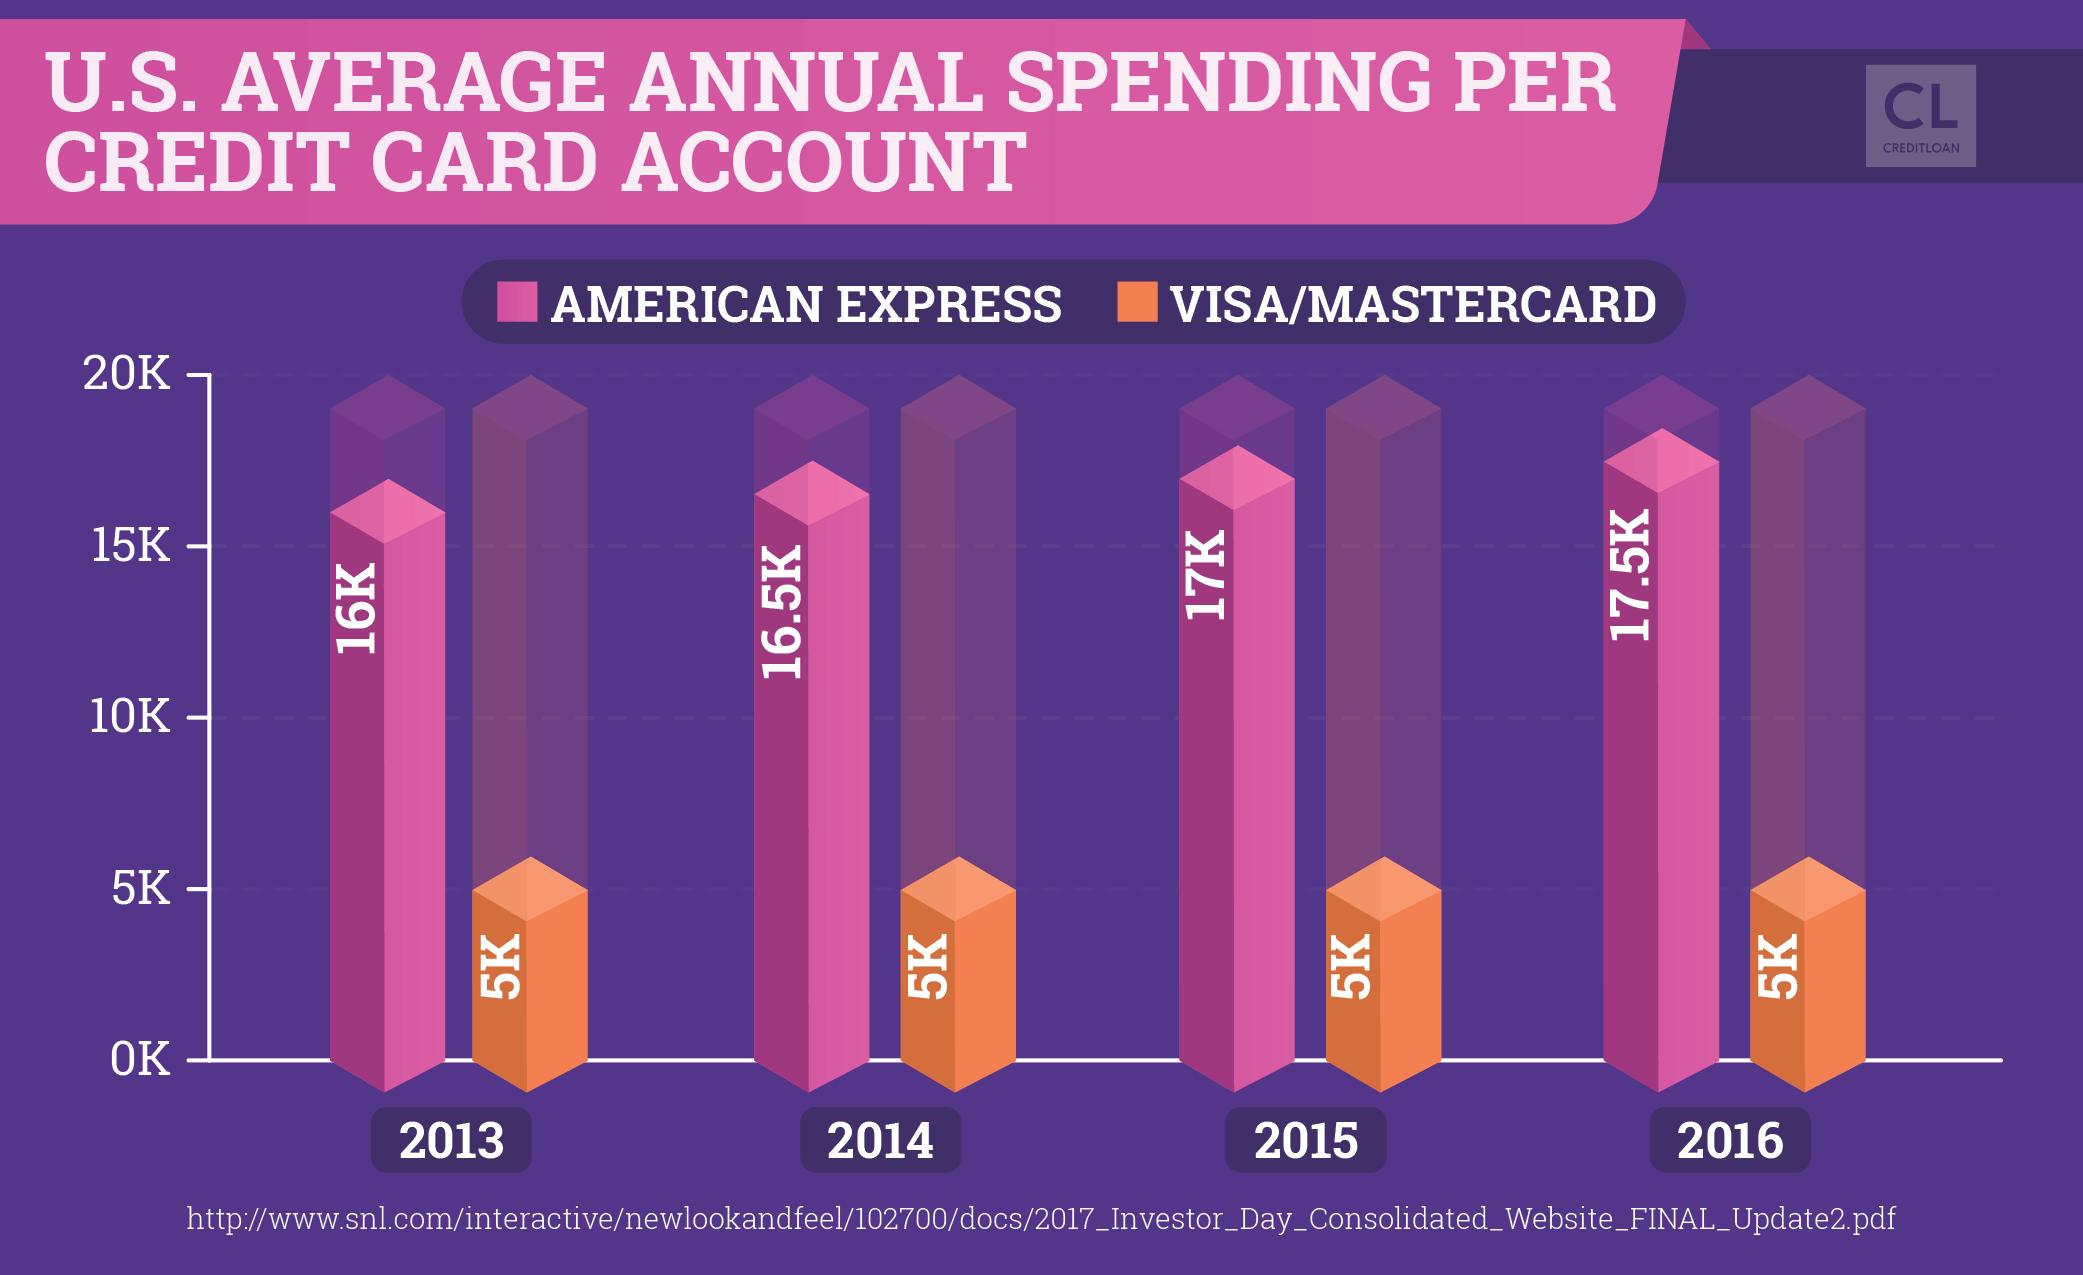 U.S. Average Annual Spending Per Credit Card Account 2013-2016